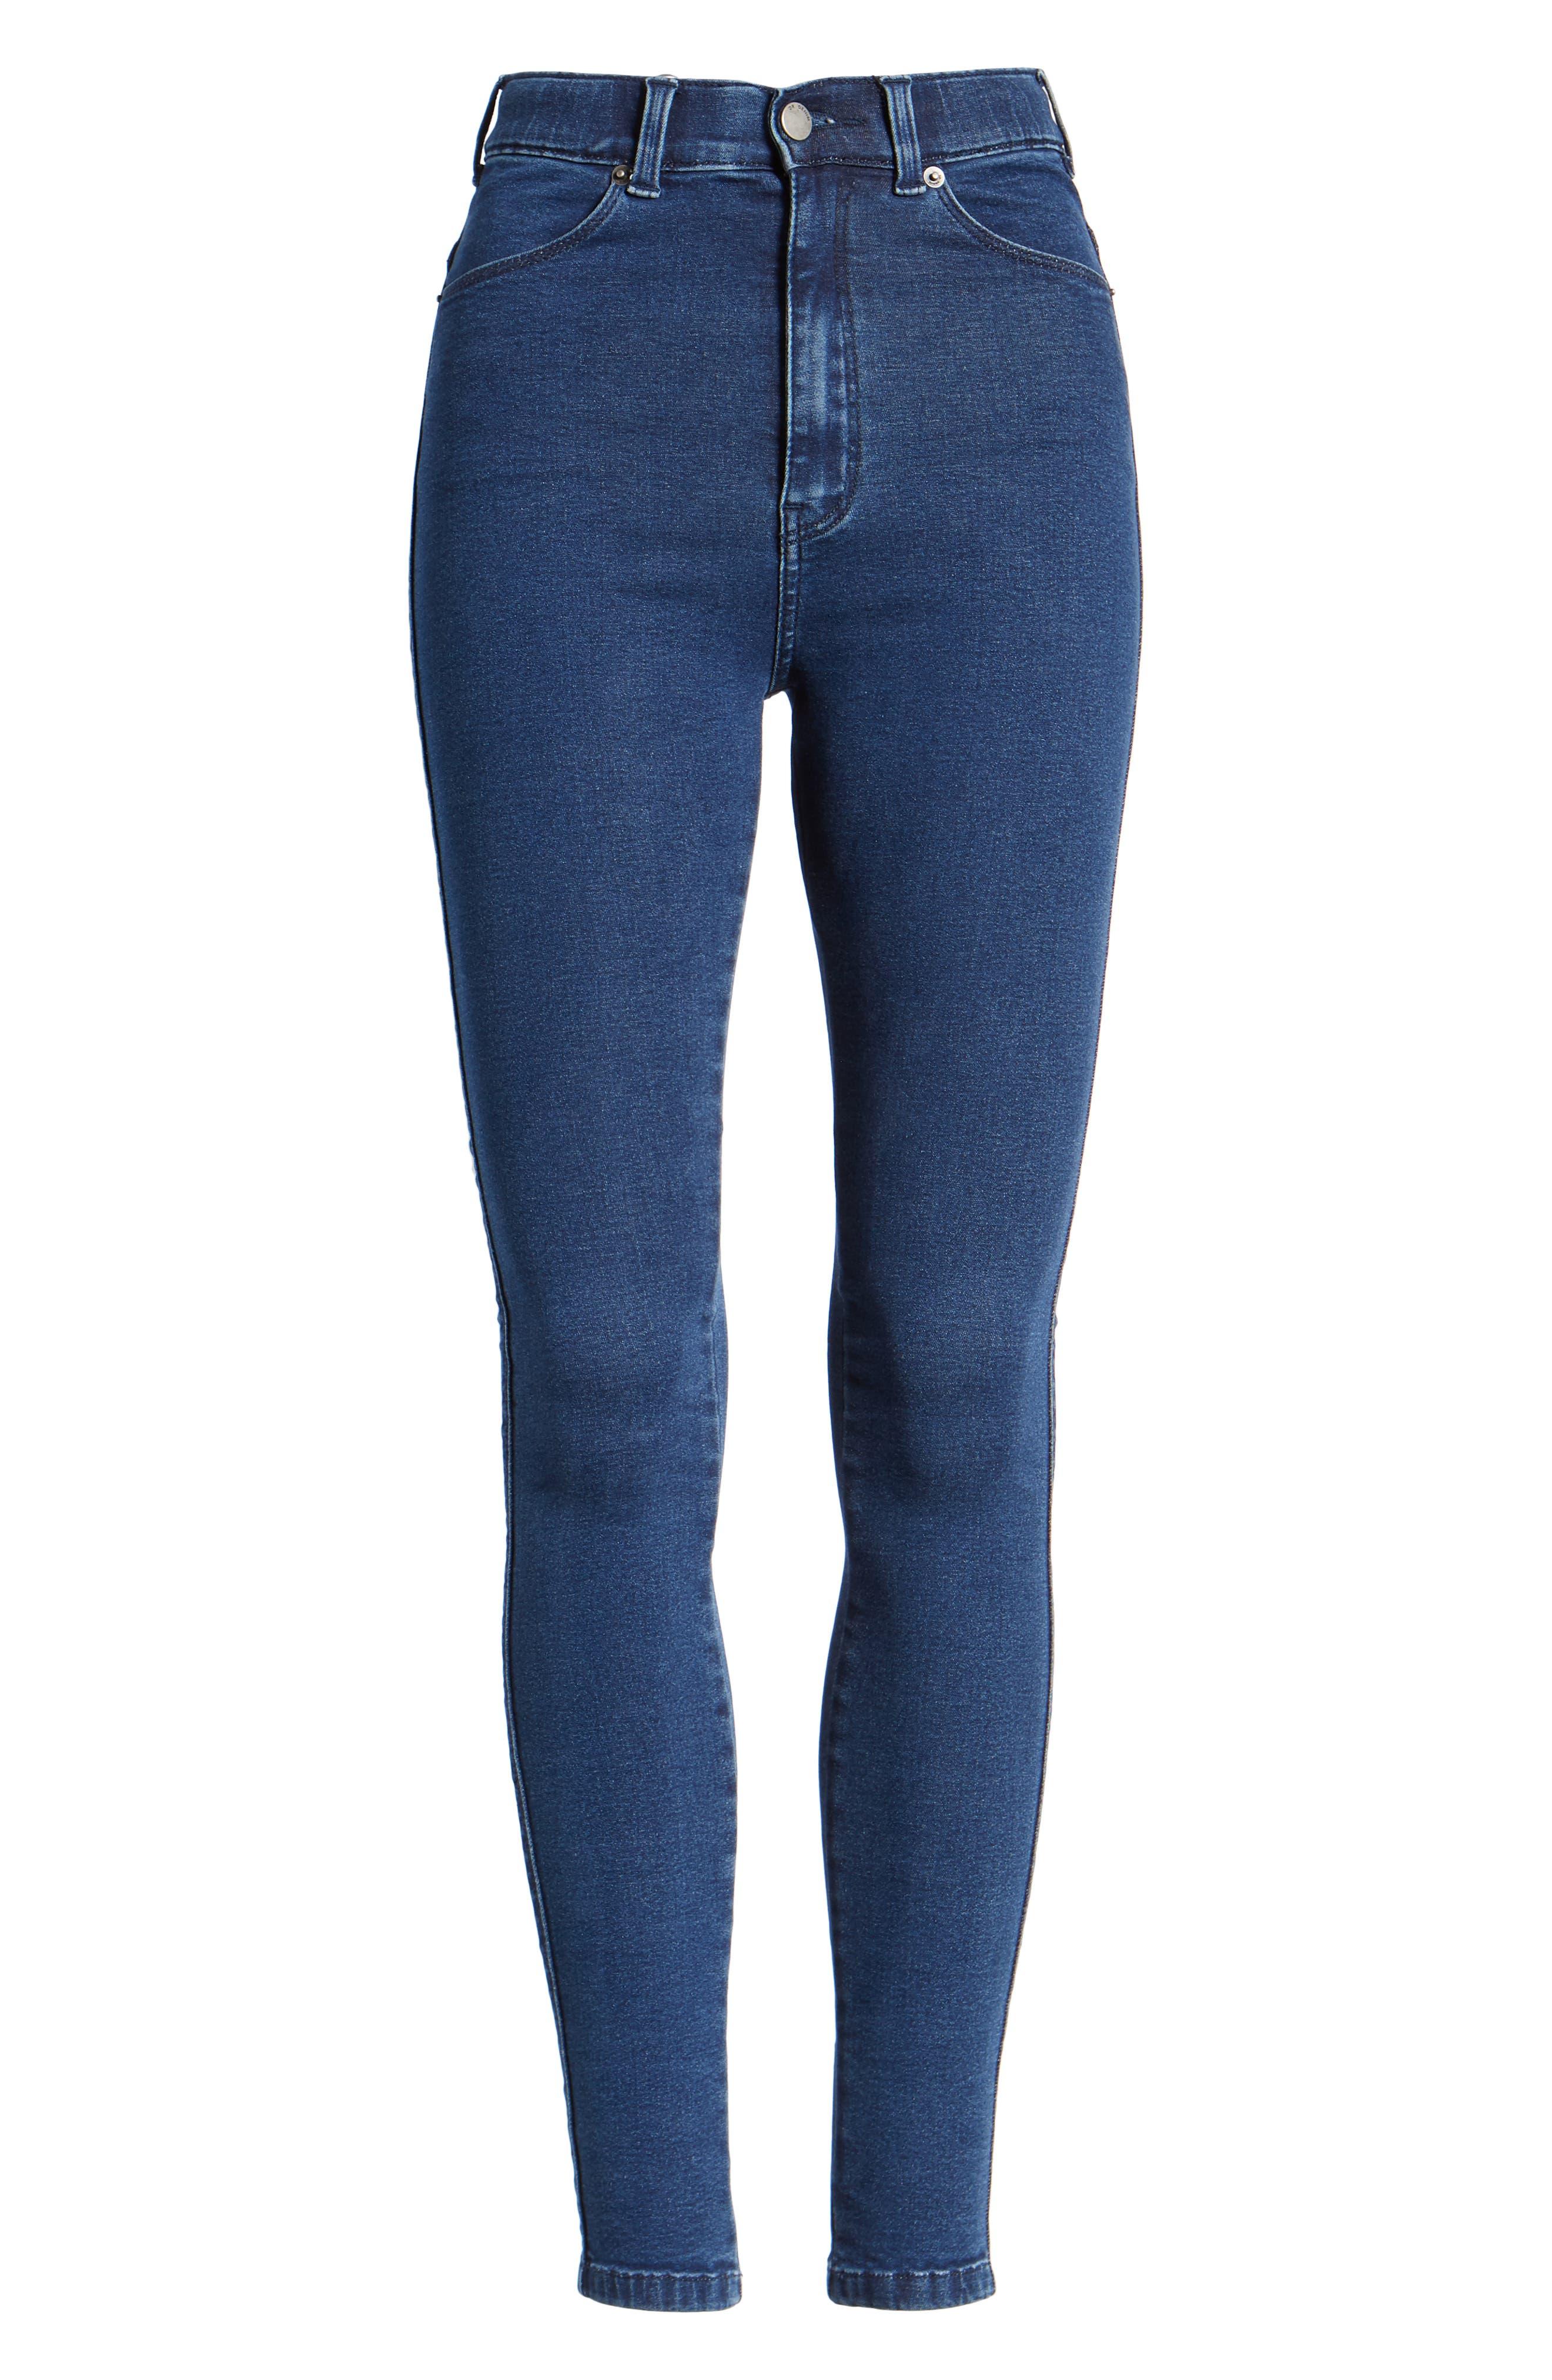 Moxy Skinny Jeans,                             Alternate thumbnail 7, color,                             400